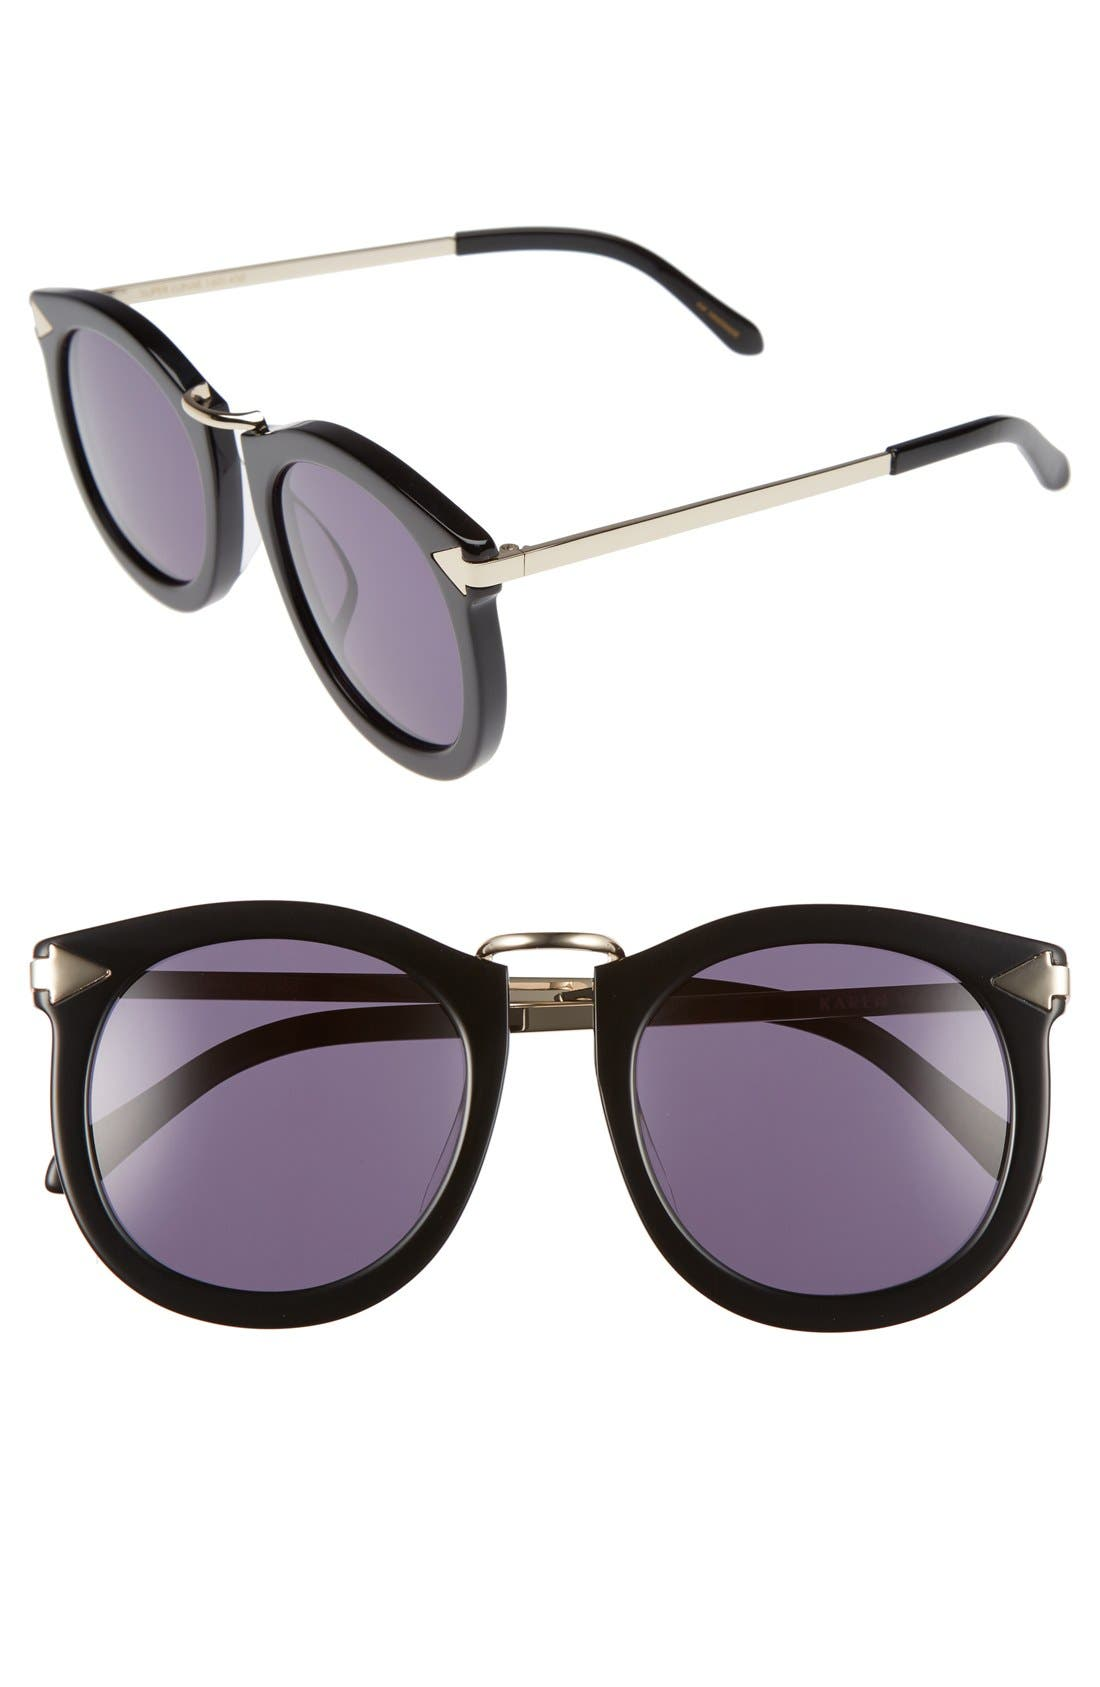 Alternative Fit Super Lunar - Arrowed by Karen 50mm Sunglasses,                         Main,                         color,